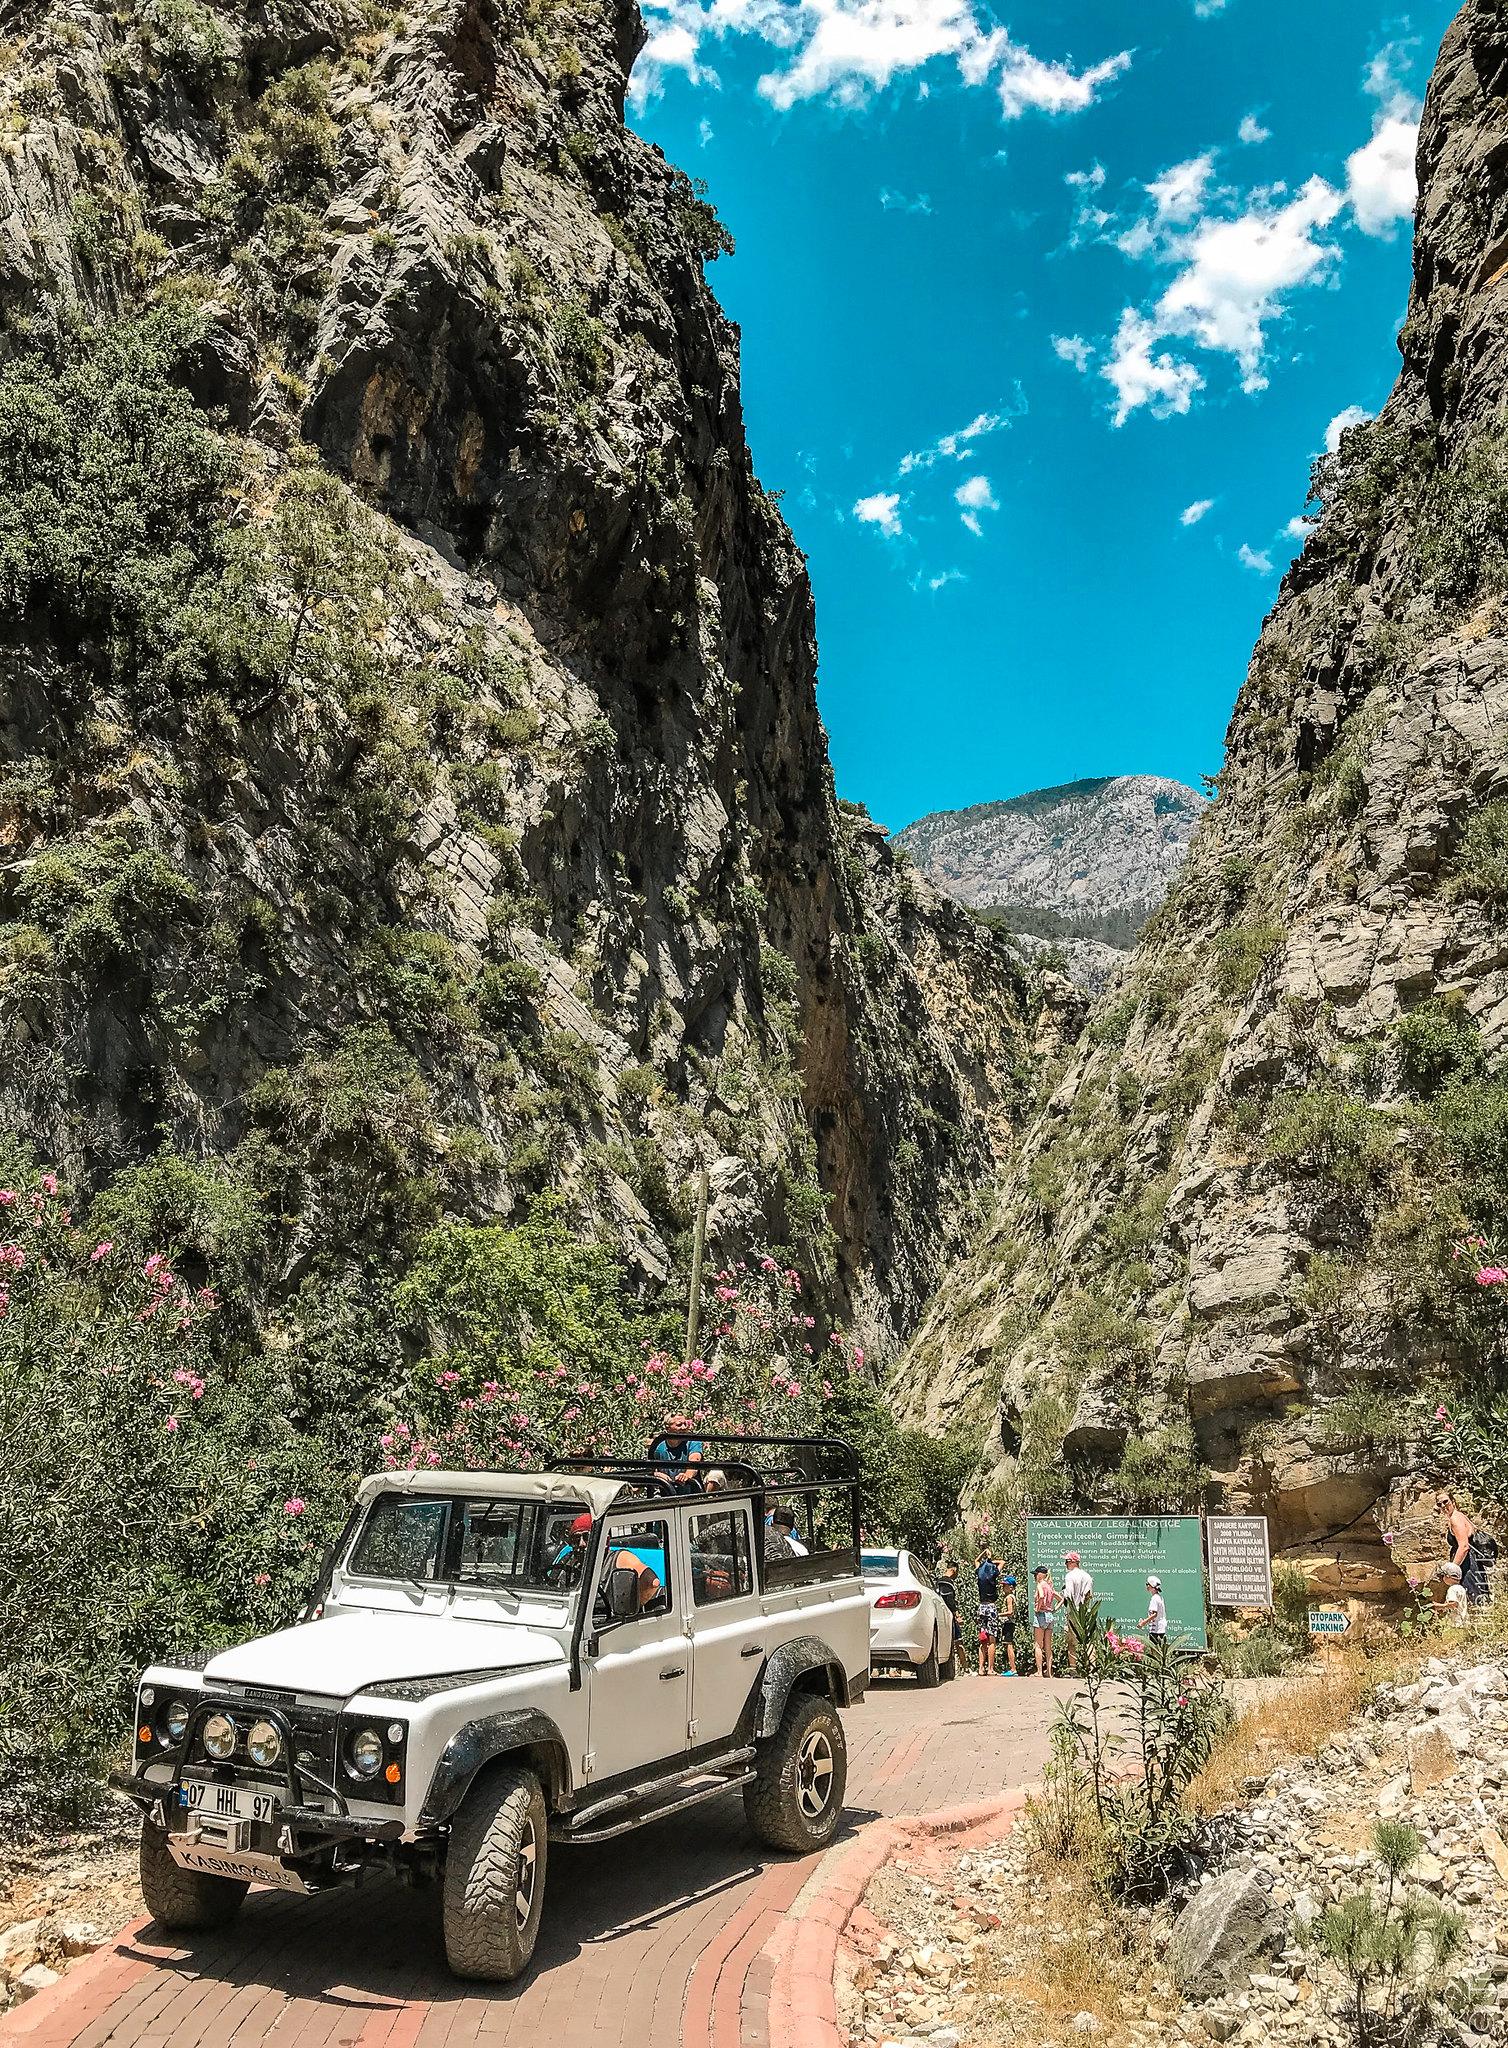 Sapadere-Canyon-Tour-экскурсия-в-каньон-сападере-8509